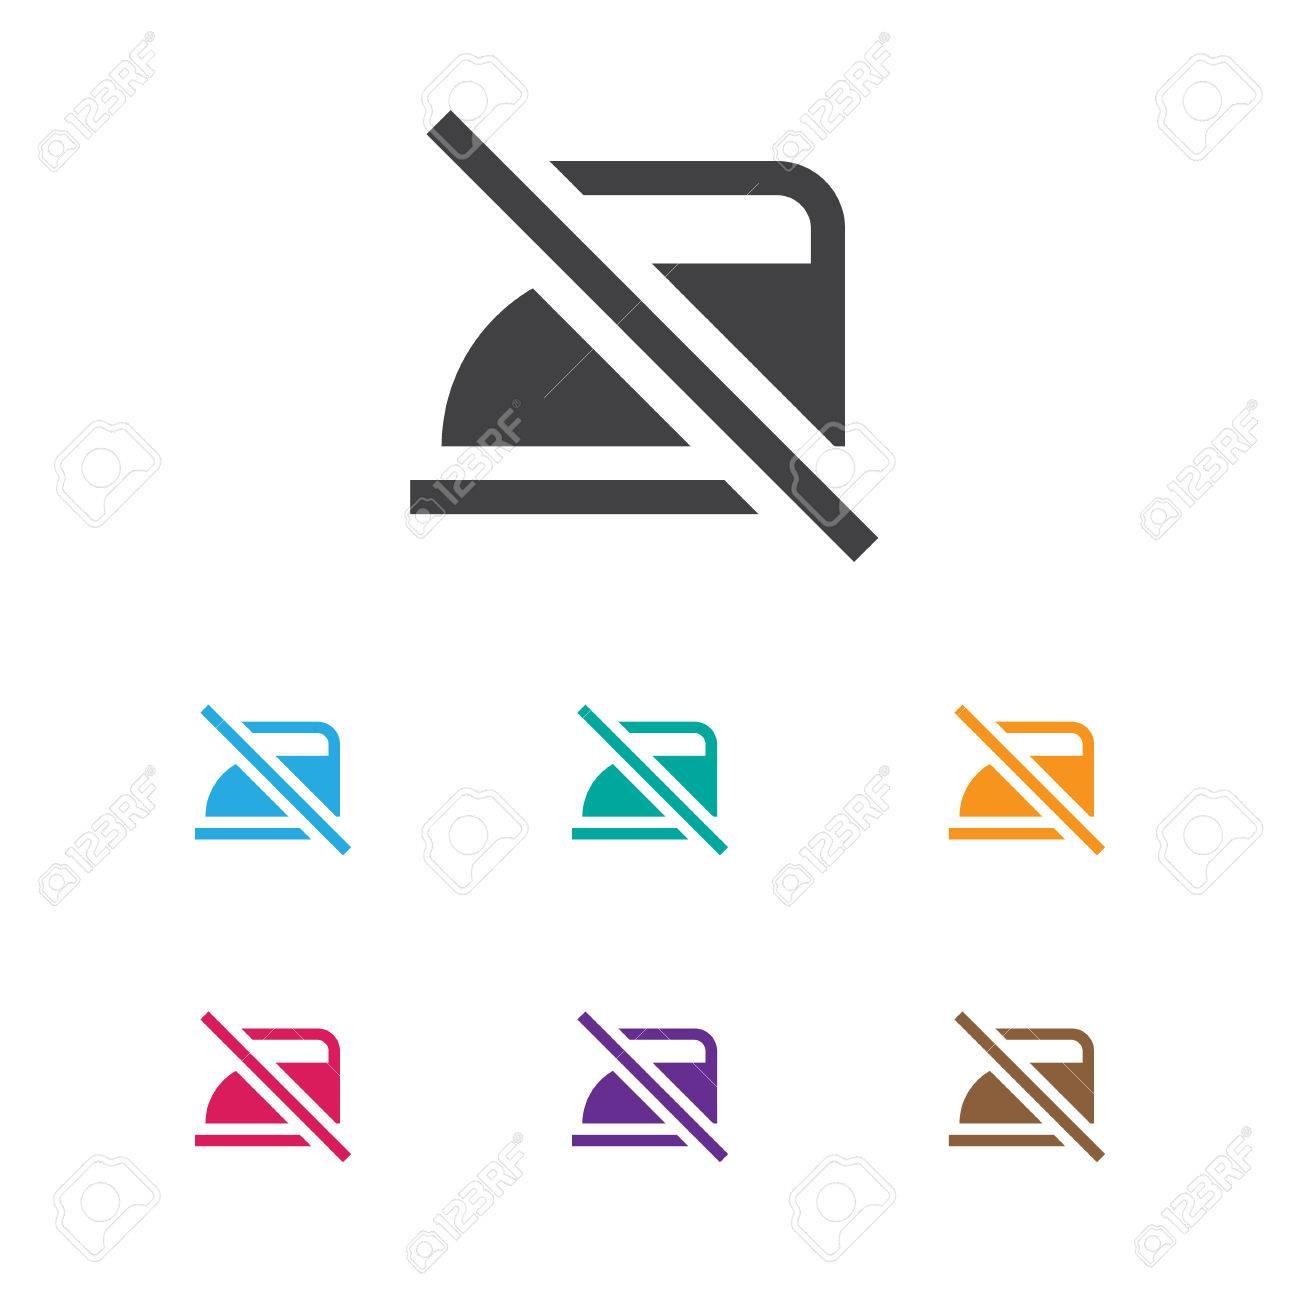 Vector Illustration Of Hygiene Symbol On Do Not Iron Icon Royalty